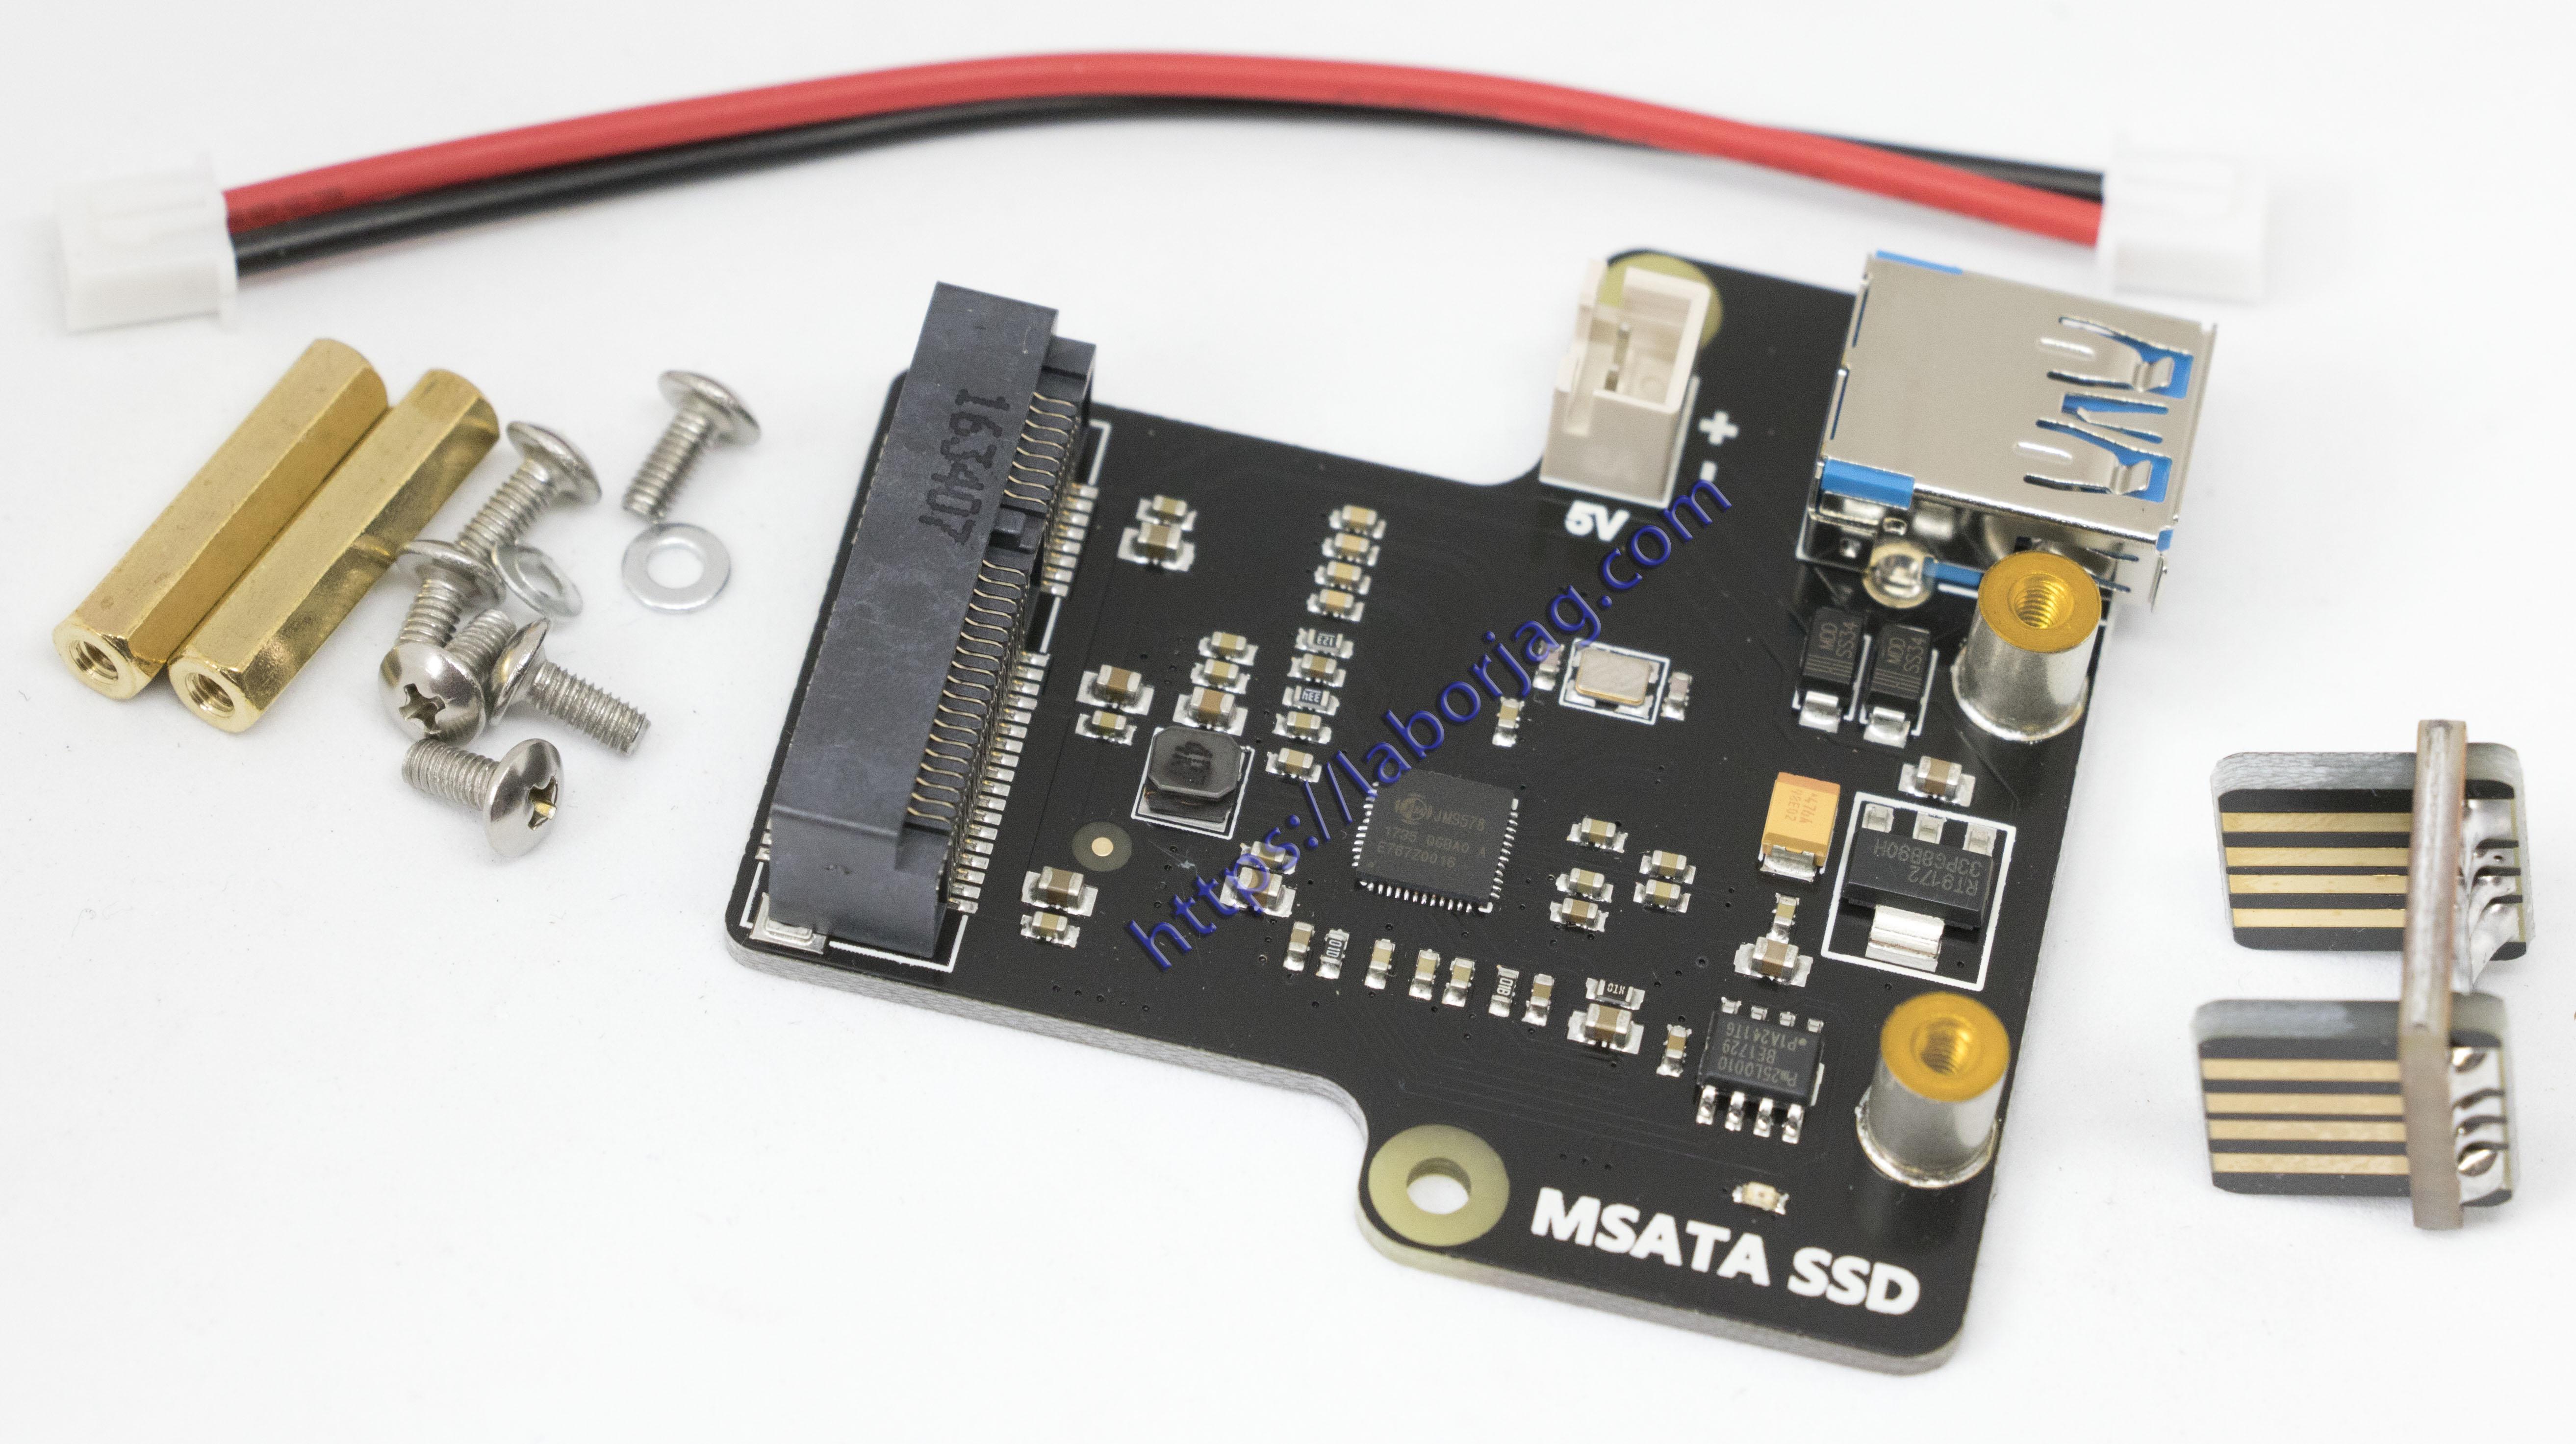 mSATA SSD Storage Expansion Board X850   Borja Home Page